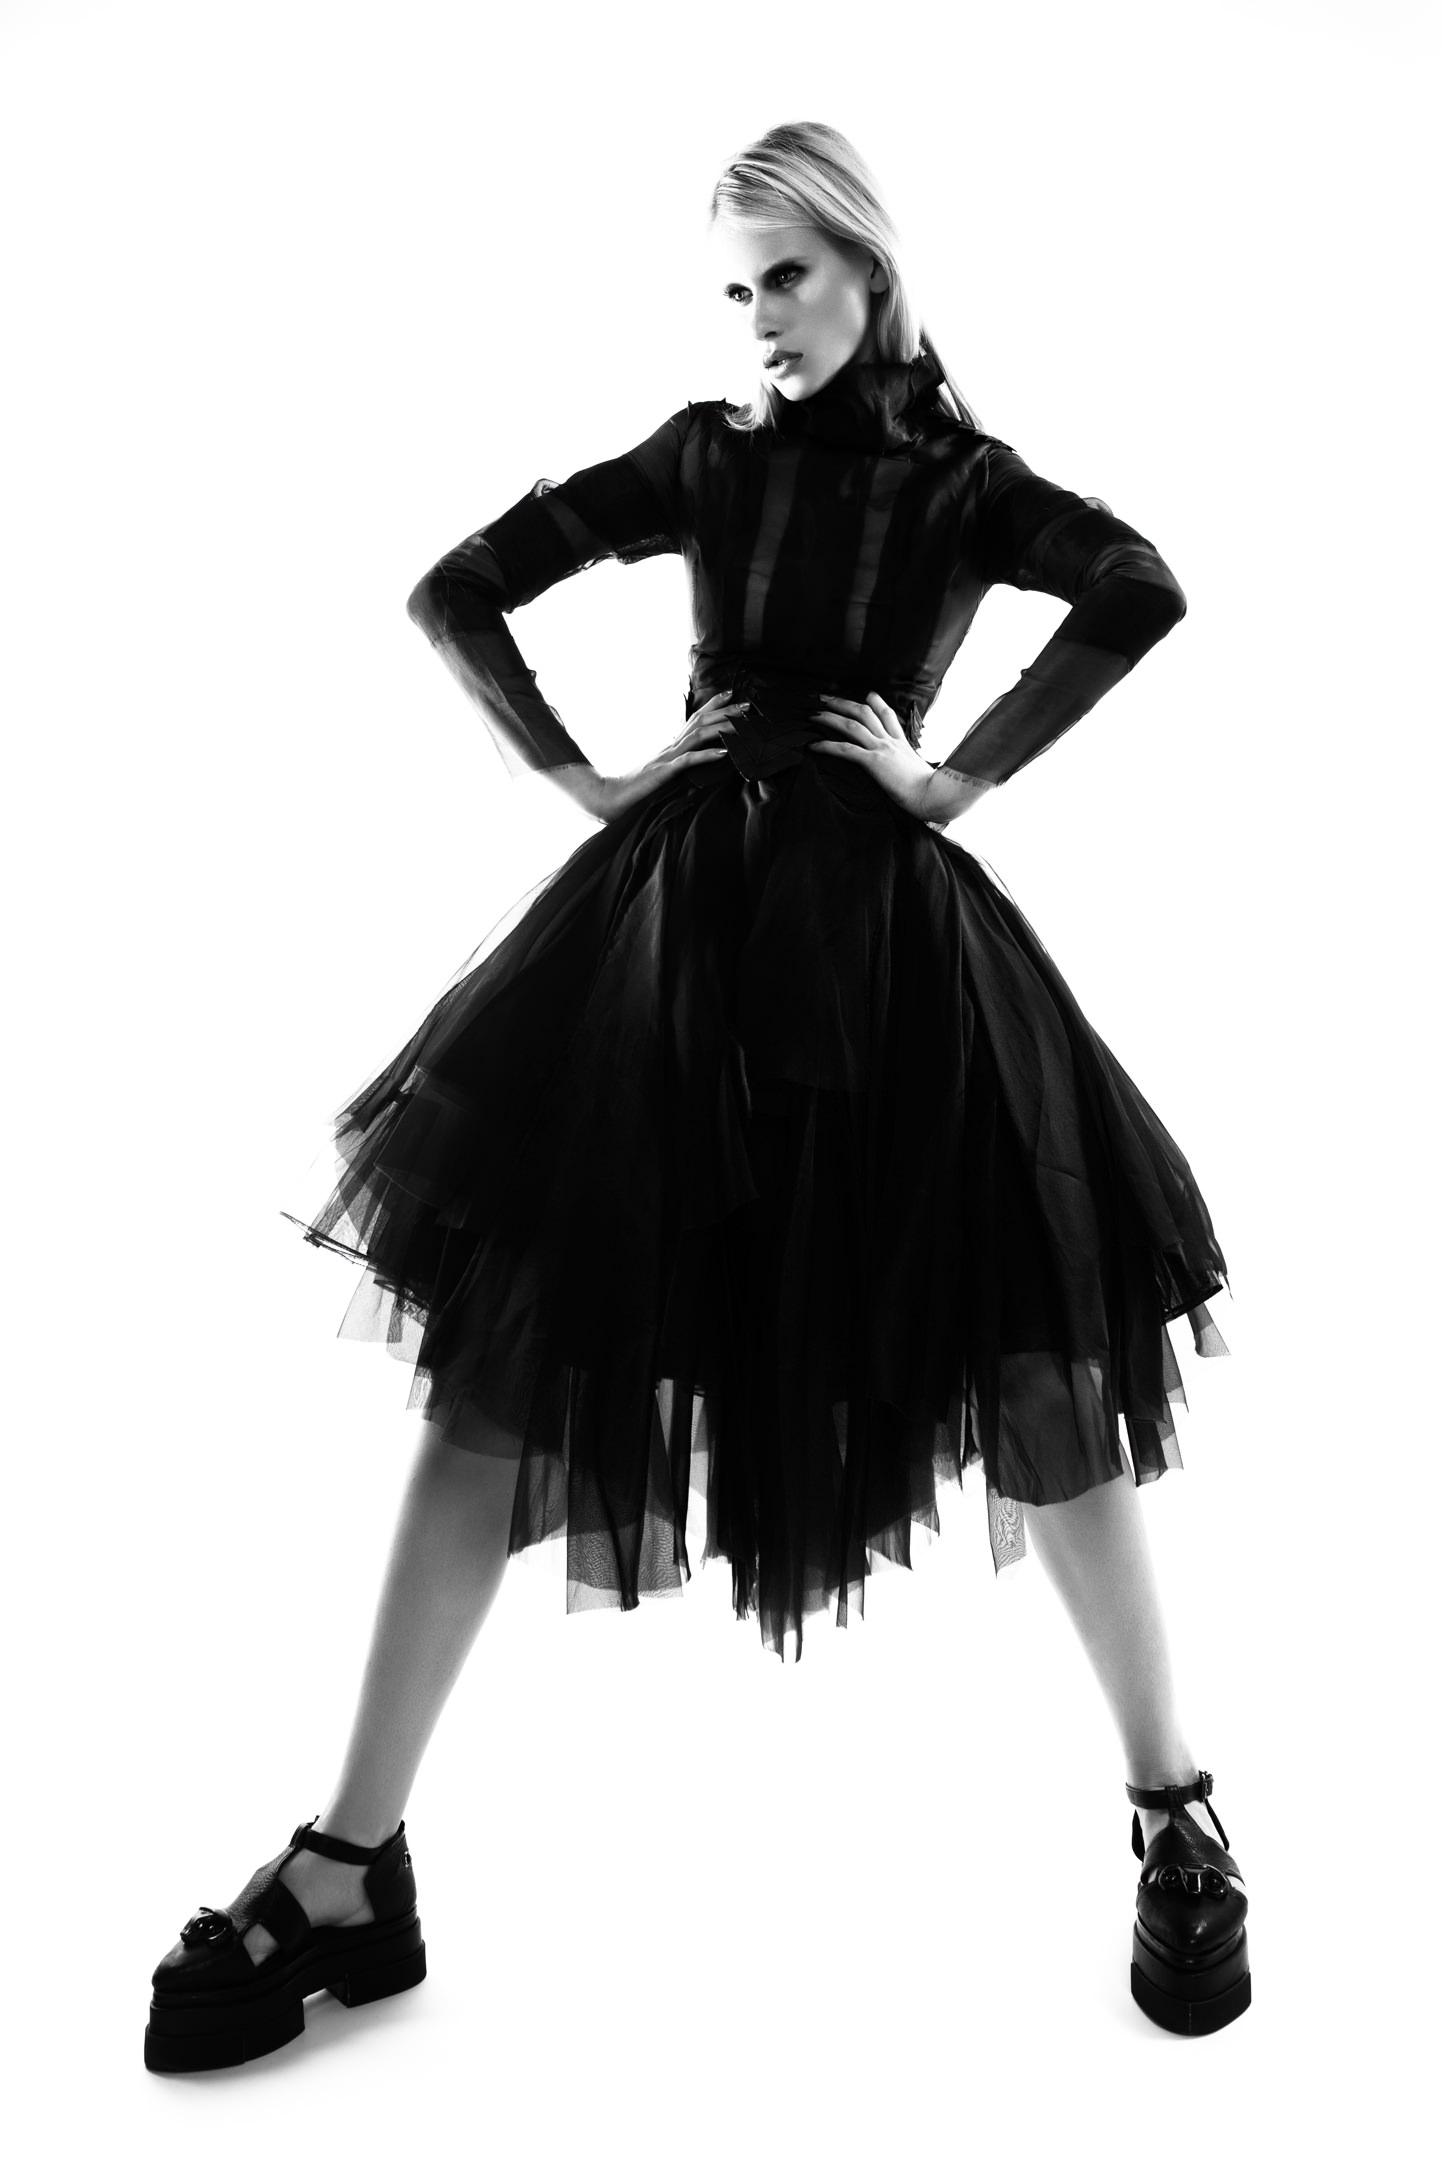 Maleficent-by-ANNA-BAZHANOVA-dh-21